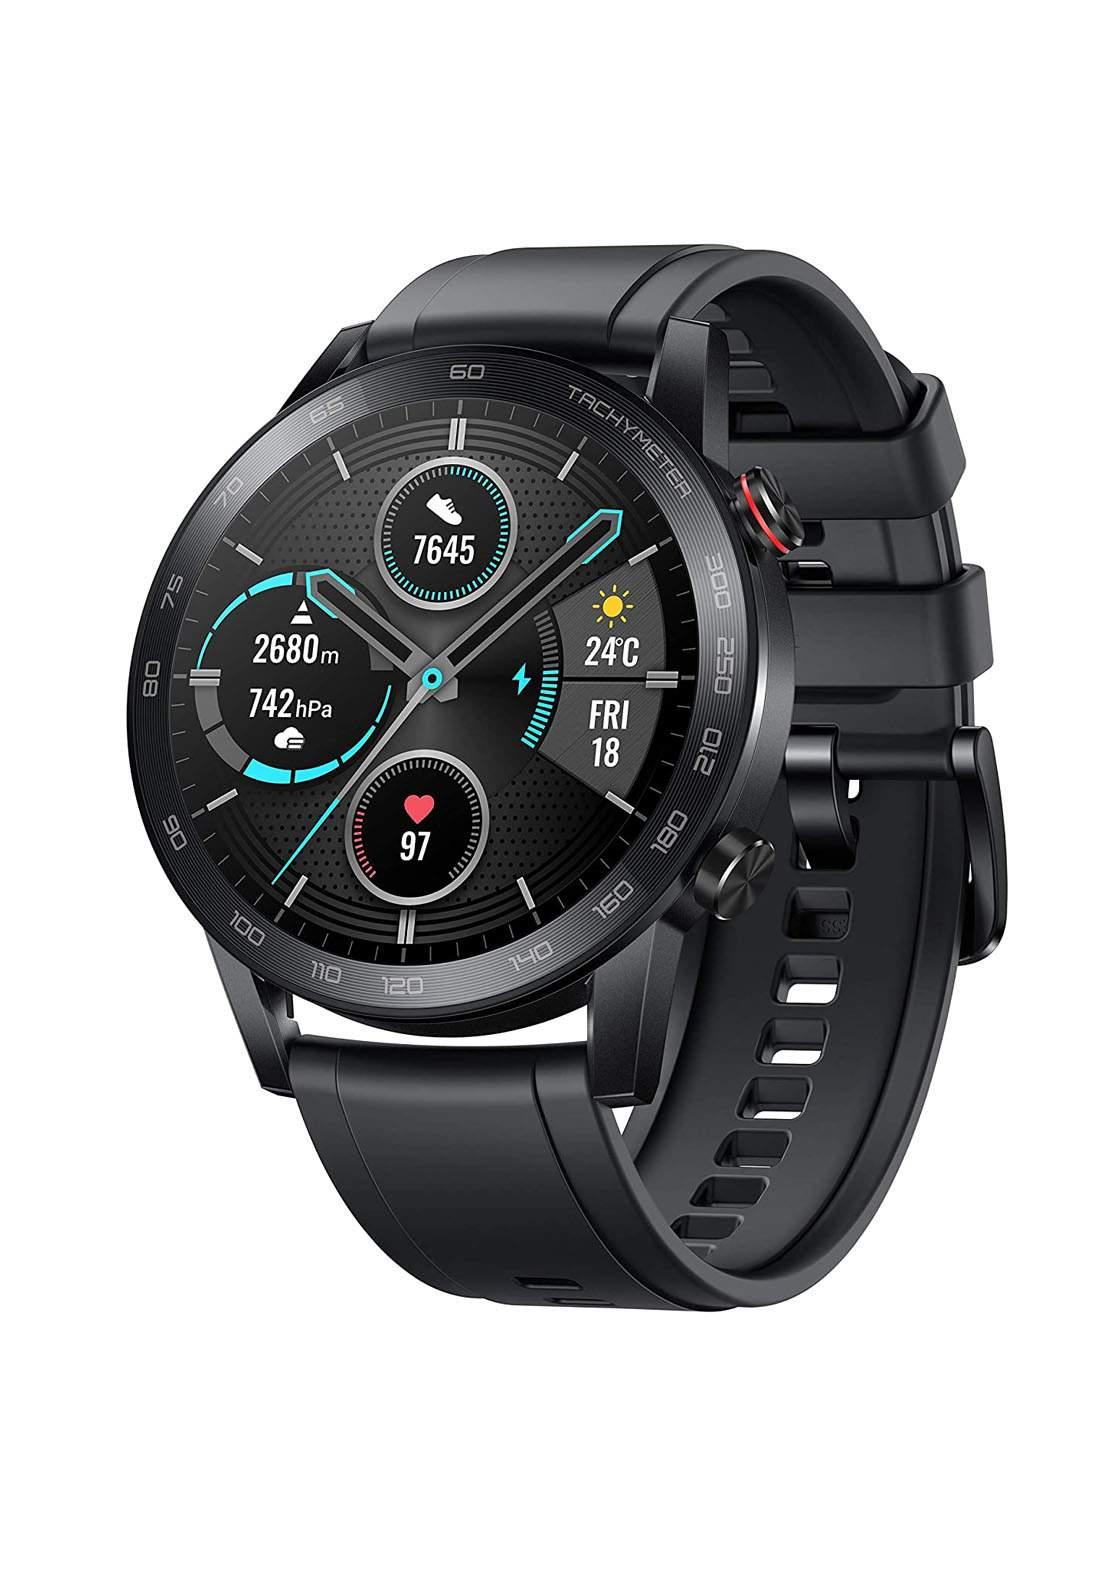 Honor MagicWatch 2 46mm Smart Watch - Charcoal Black ساعة ذكية